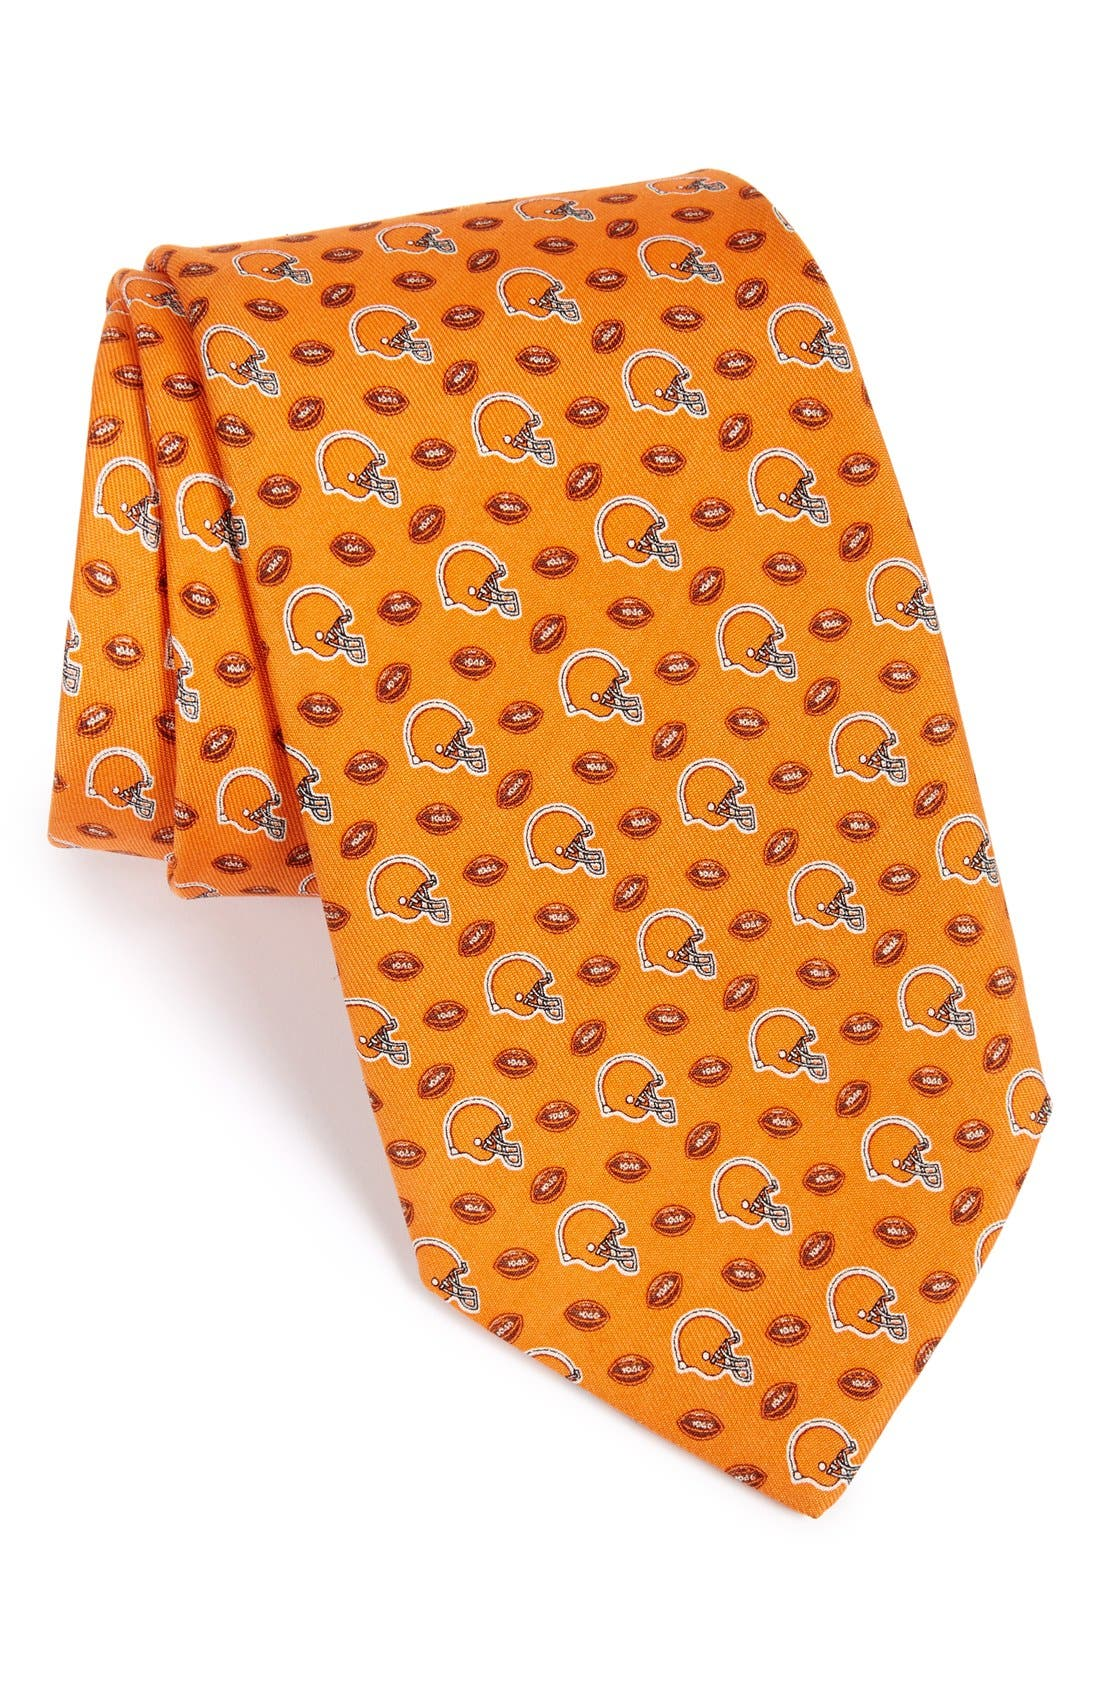 VINEYARD VINES 'Cleveland Browns - NFL' Woven Silk